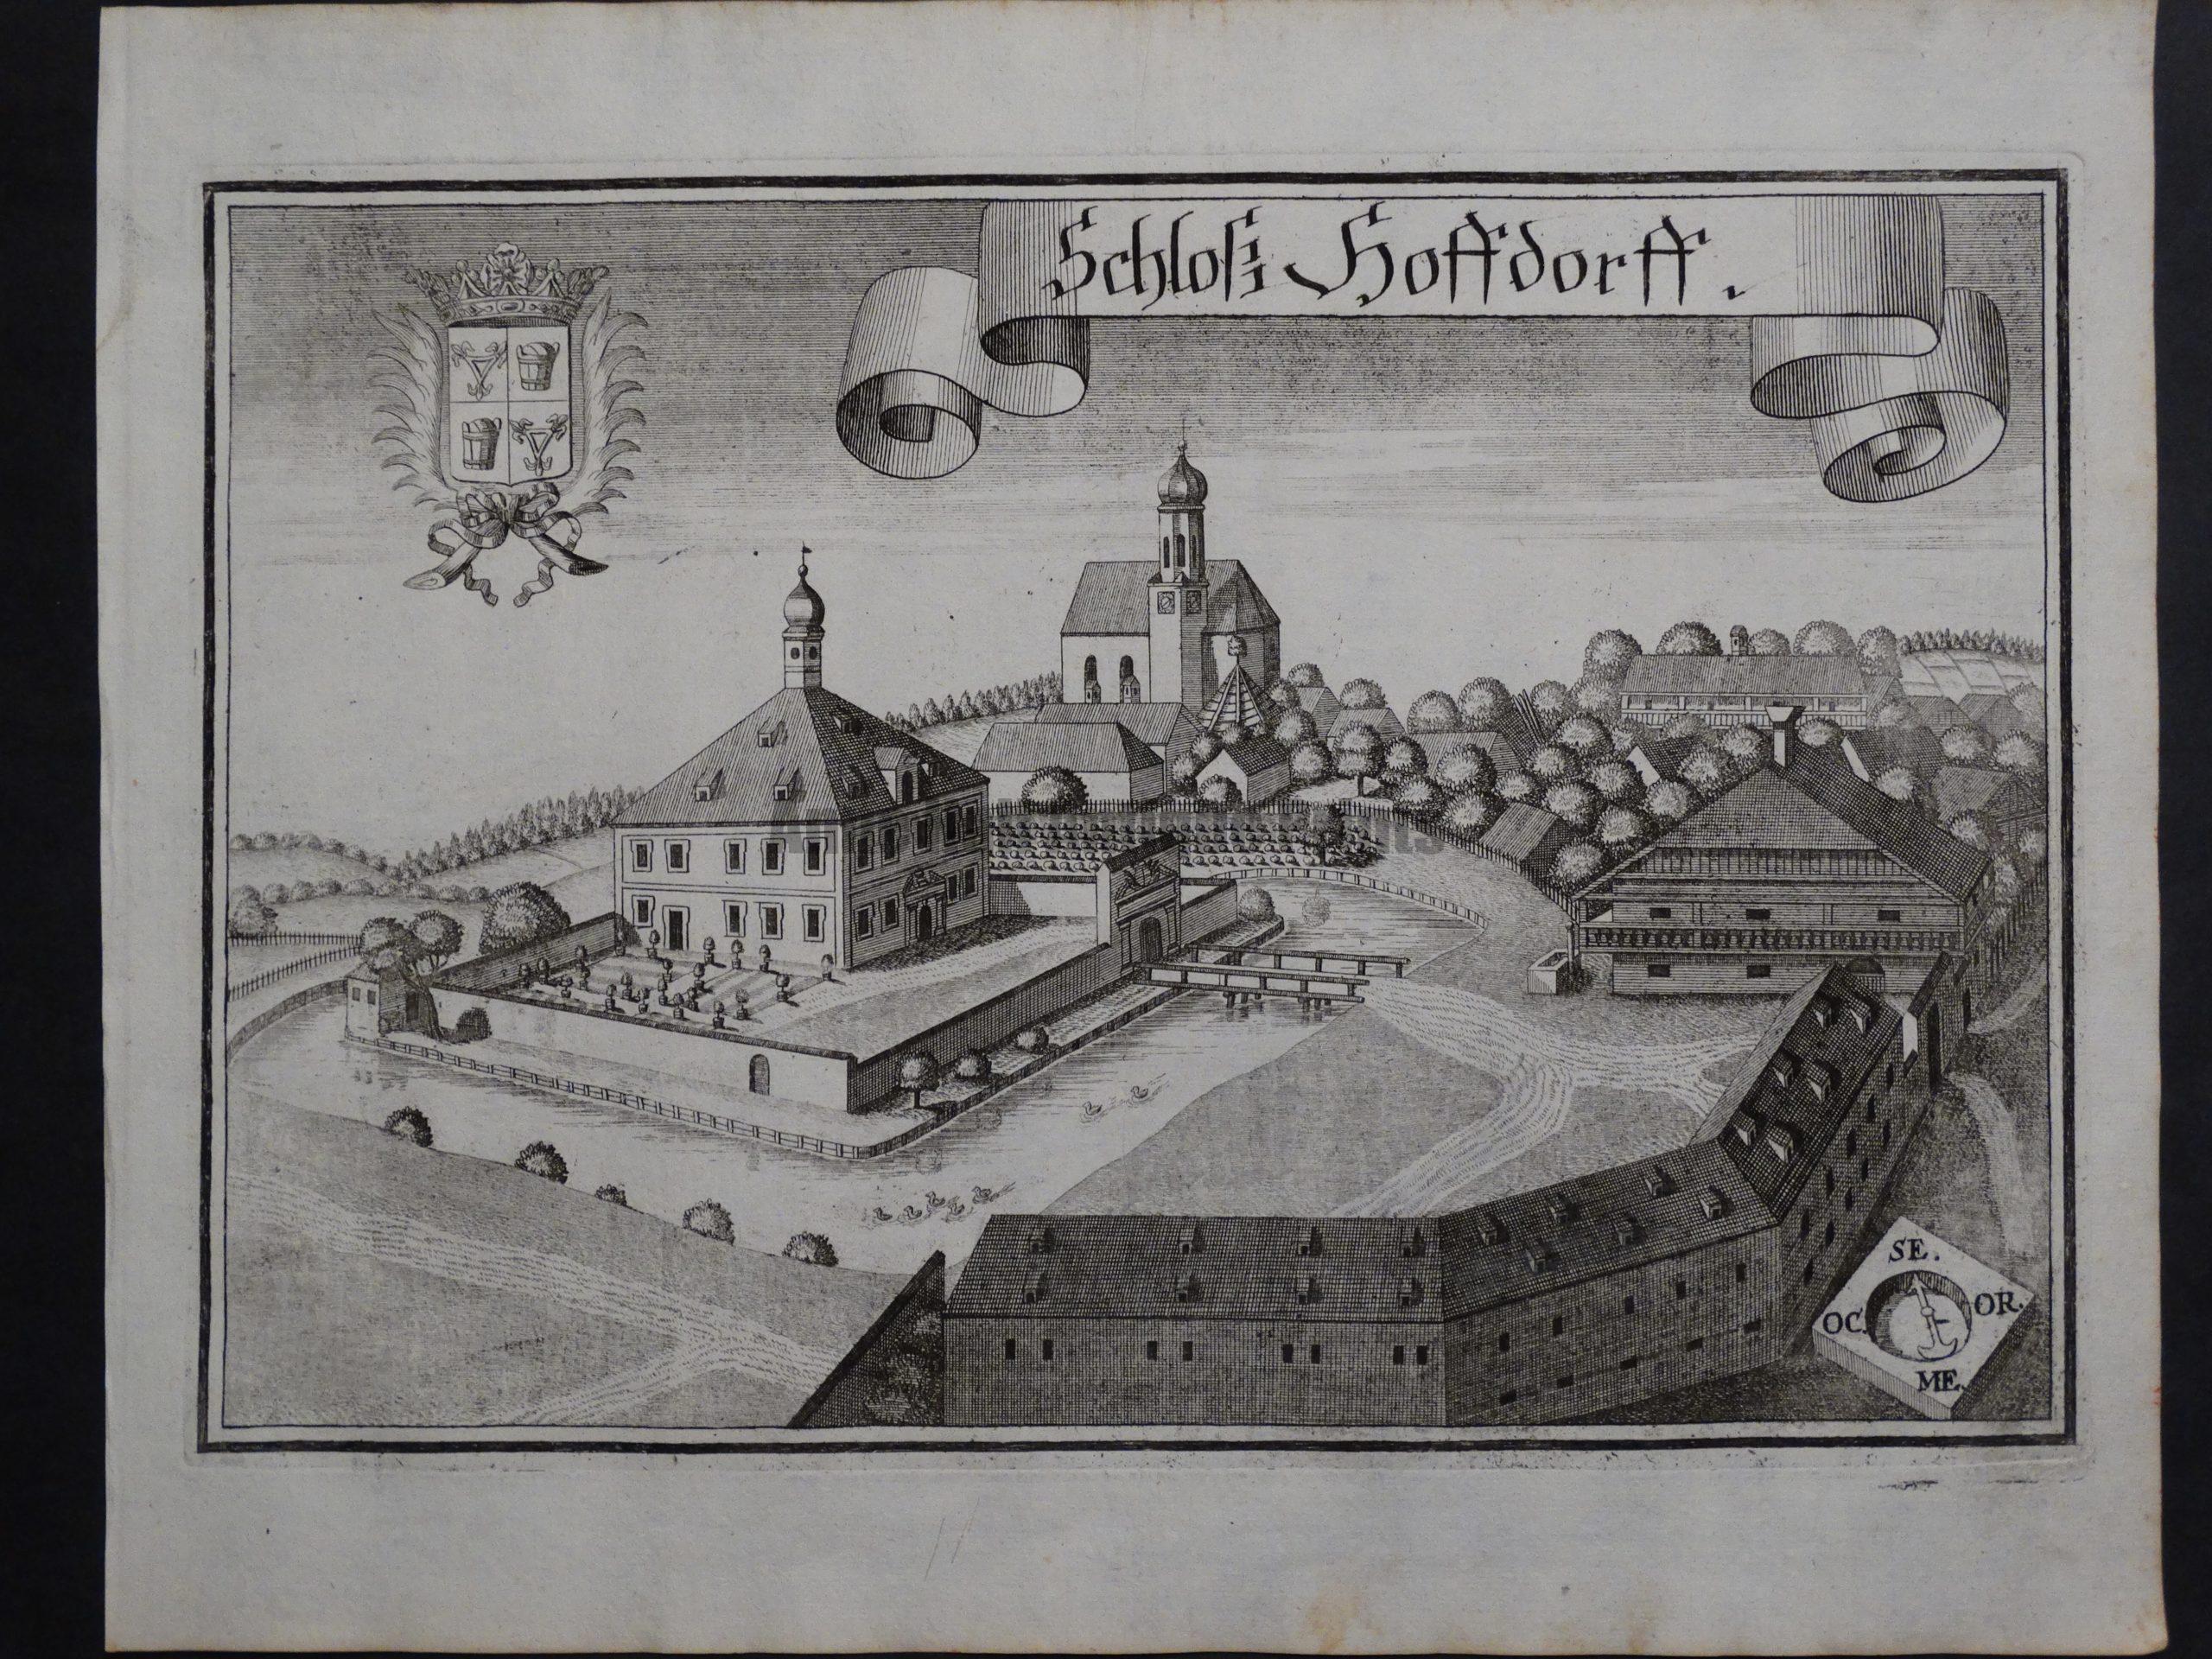 Werning Bavaria Rare Castle Engraving 1703(6). $300.